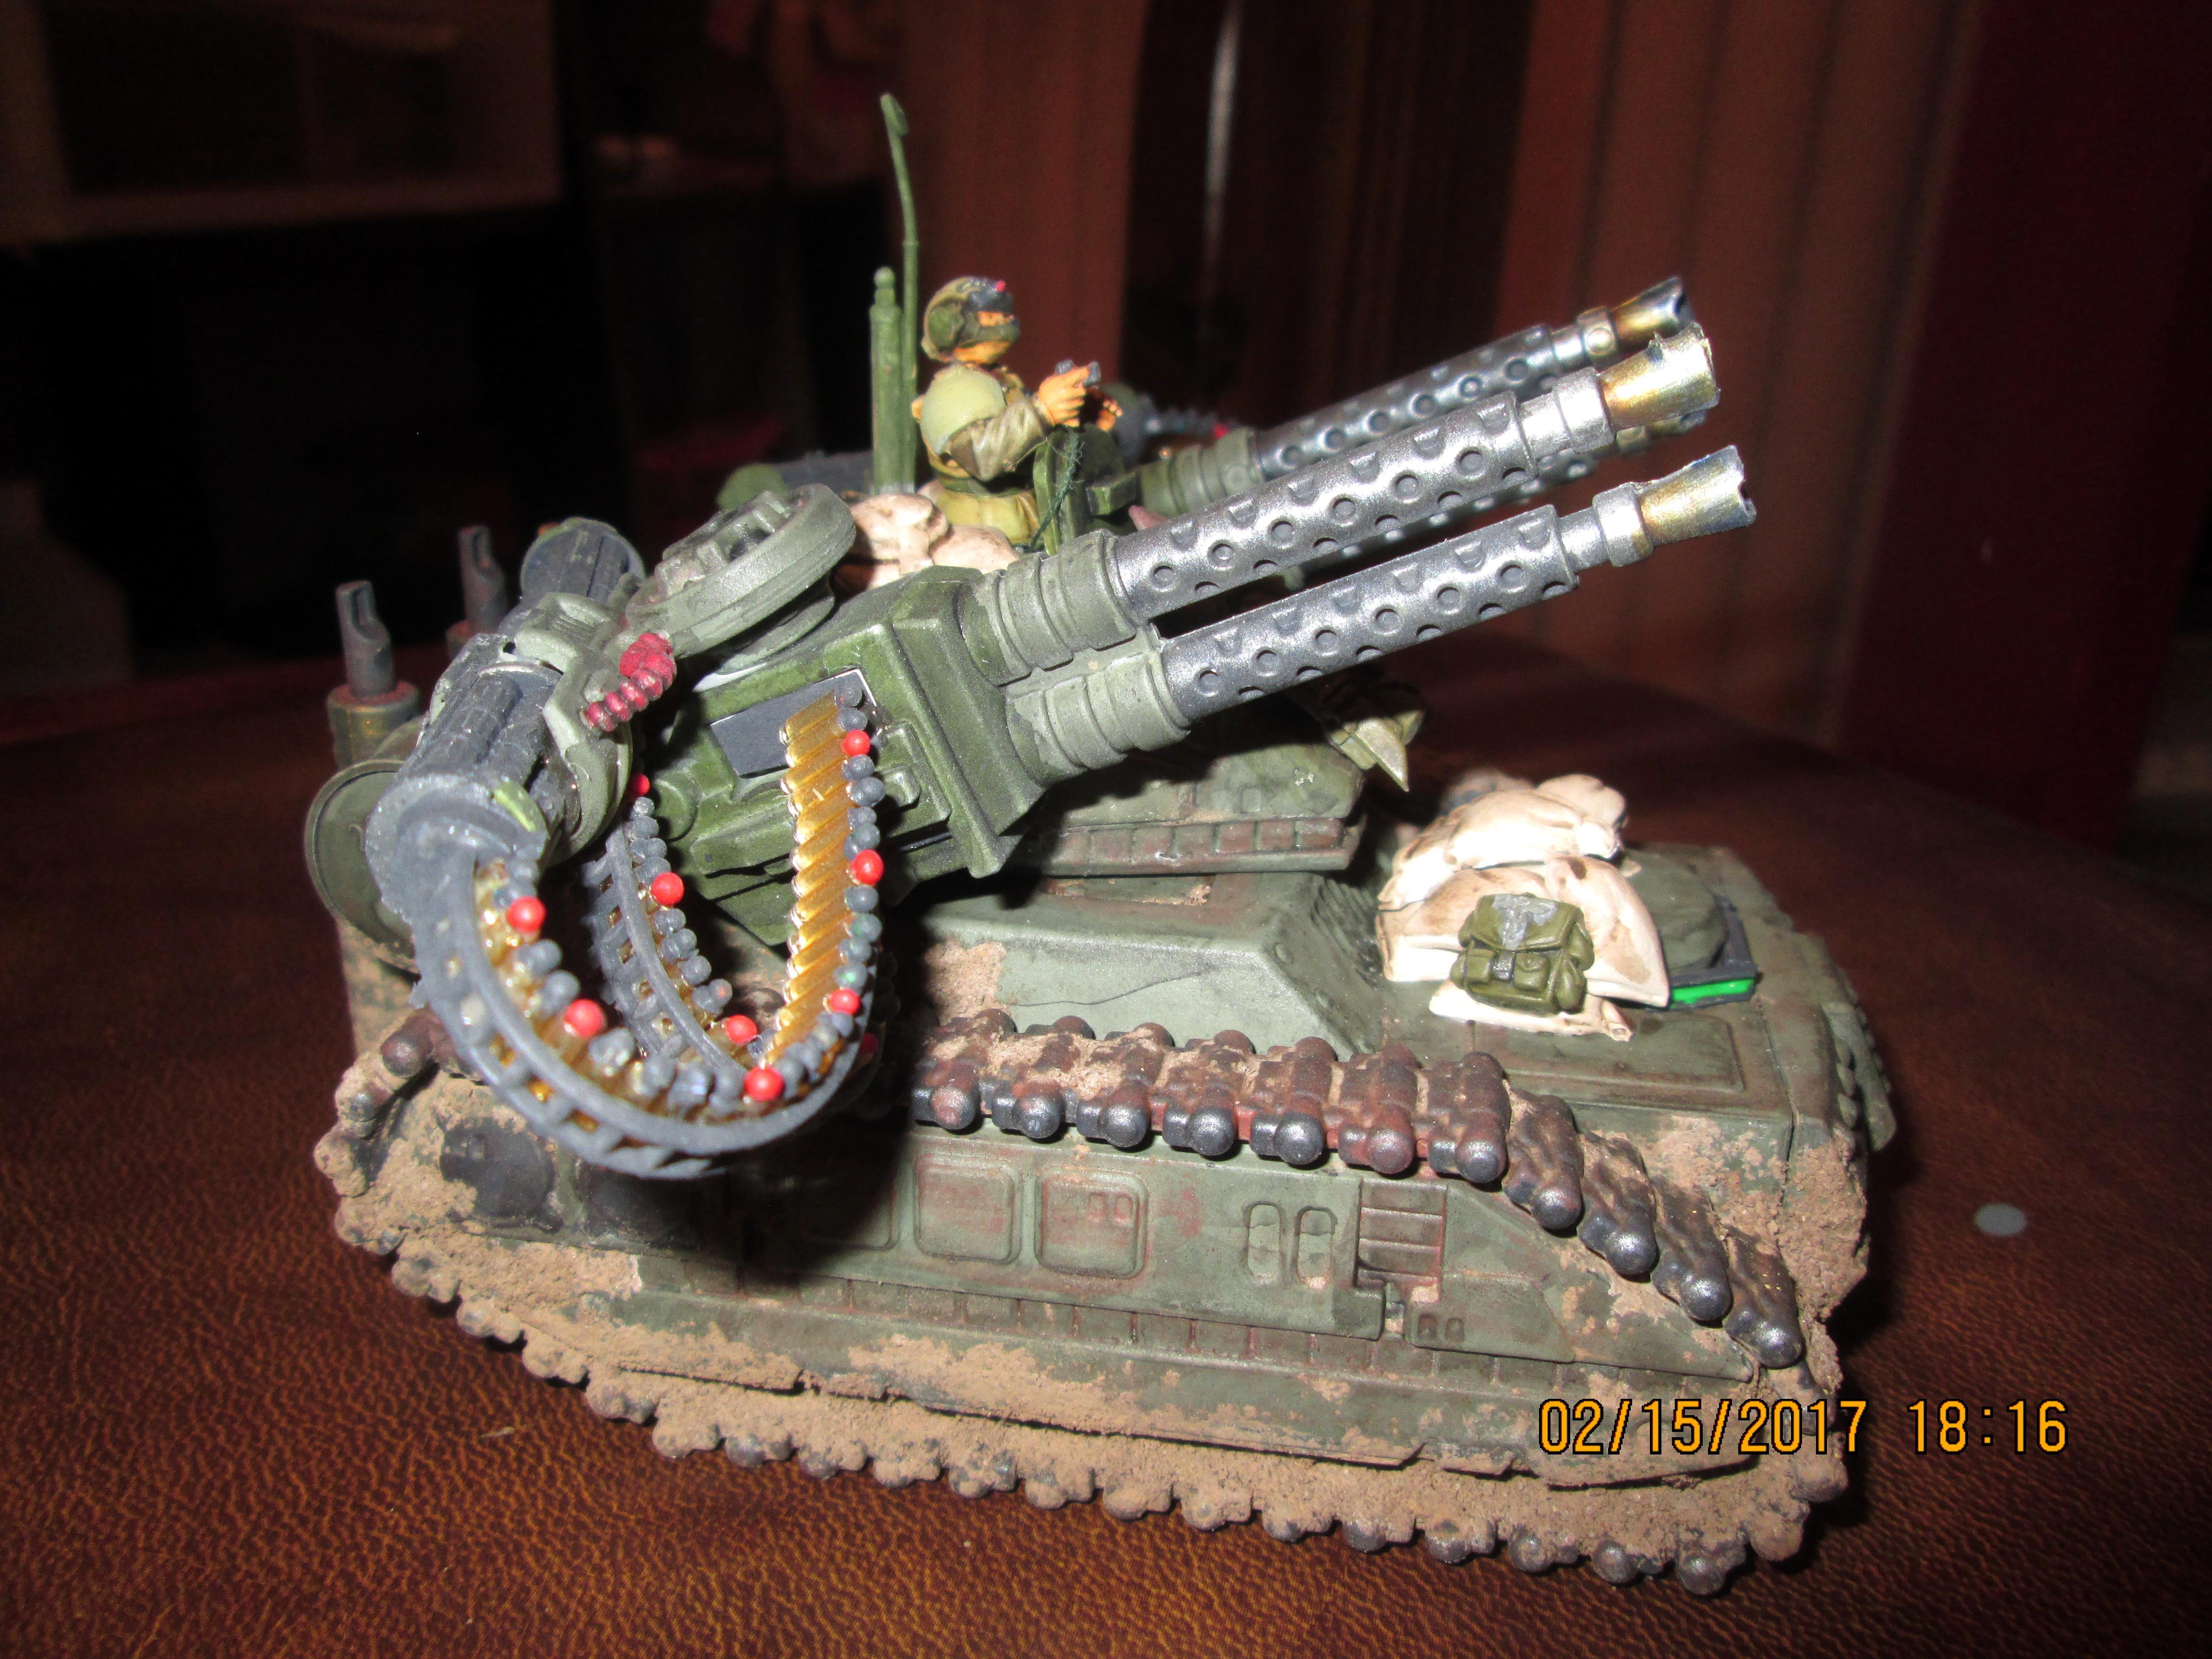 Bronekorpus, Conversion, Flak Panzer, Hydra, Imperial Guard, Robogear, Tank